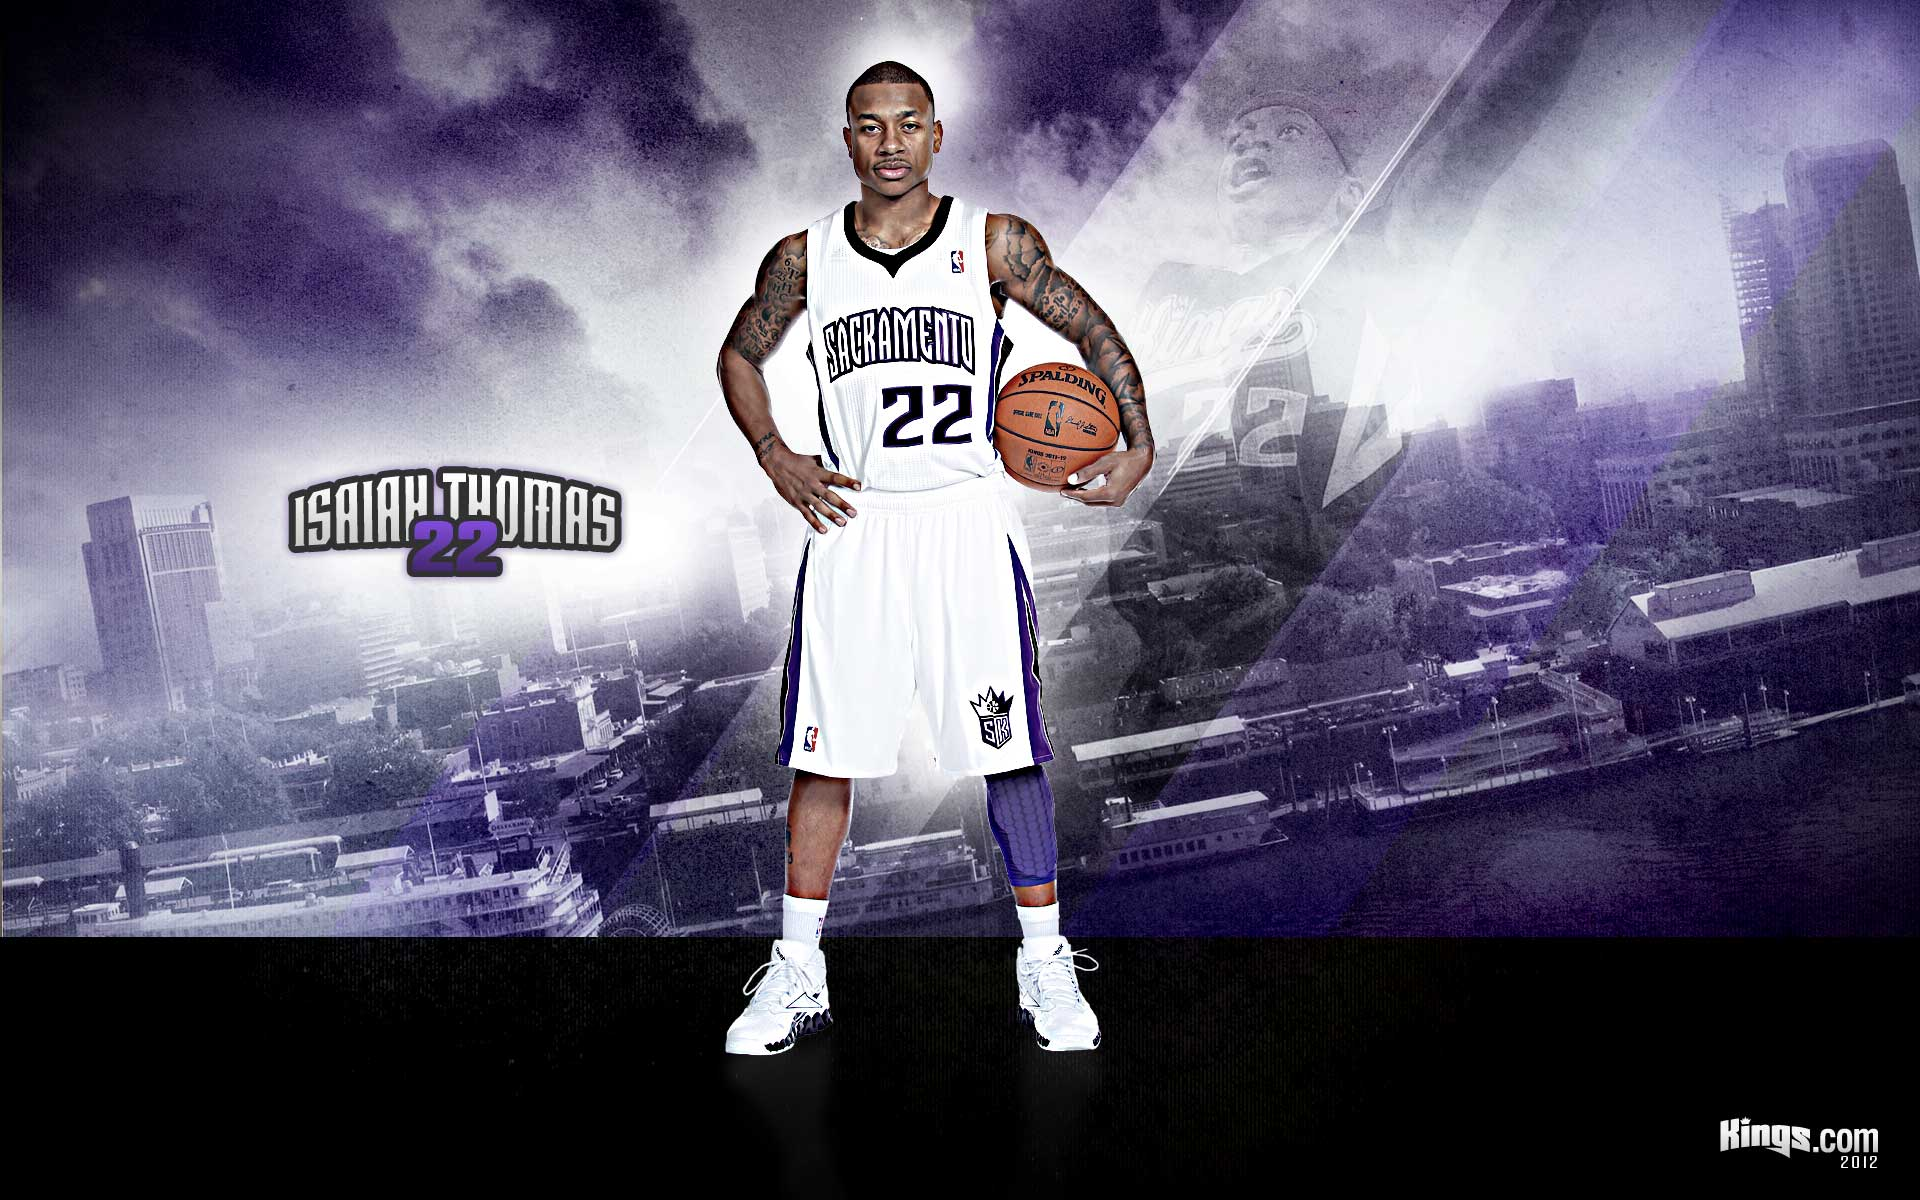 SACRAMENTO KINGS nba basketball 10 wallpaper 1920x1200 227714 1920x1200